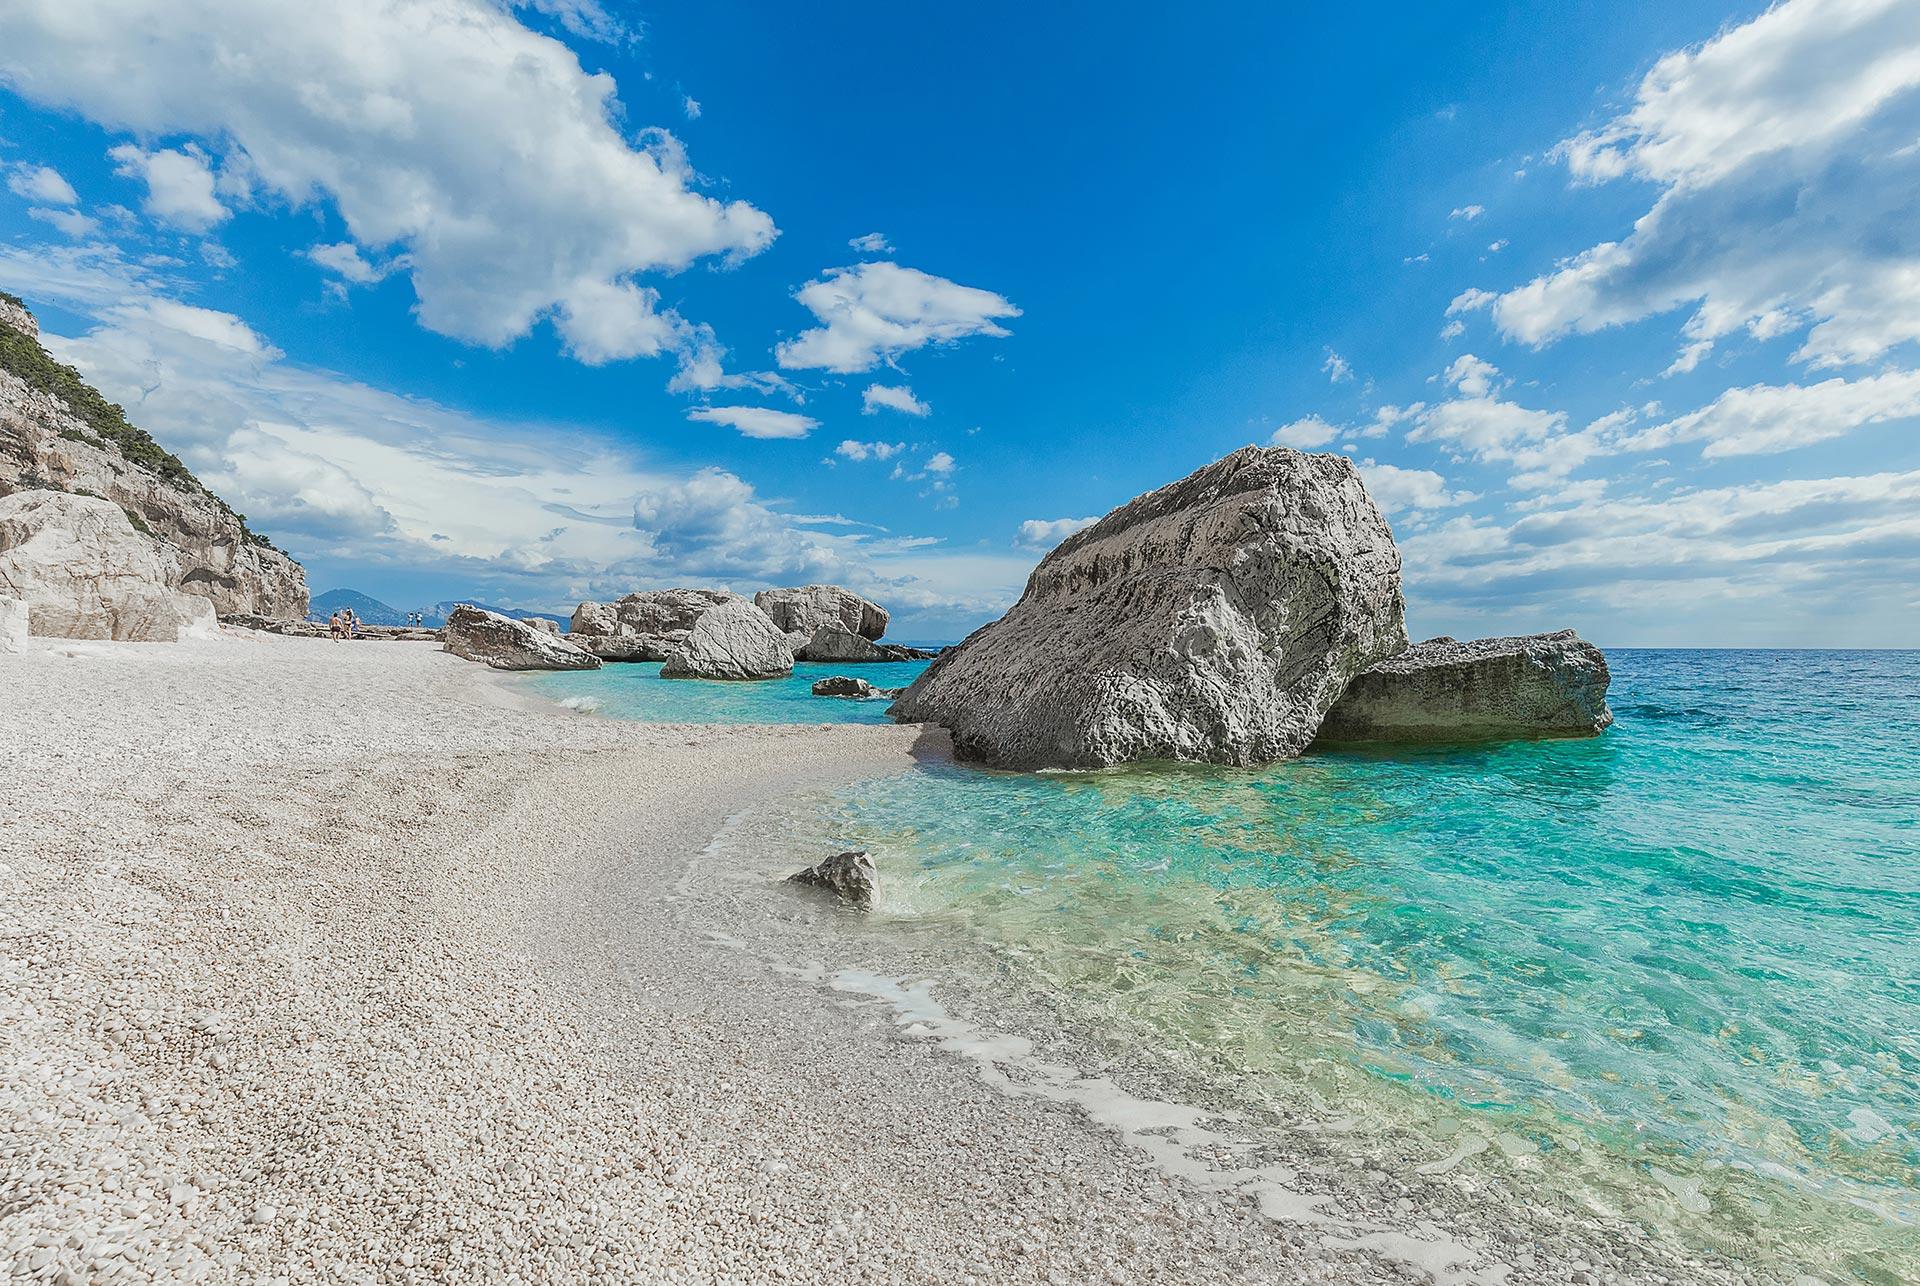 Spiaggia solitaria Cala-Mariolu